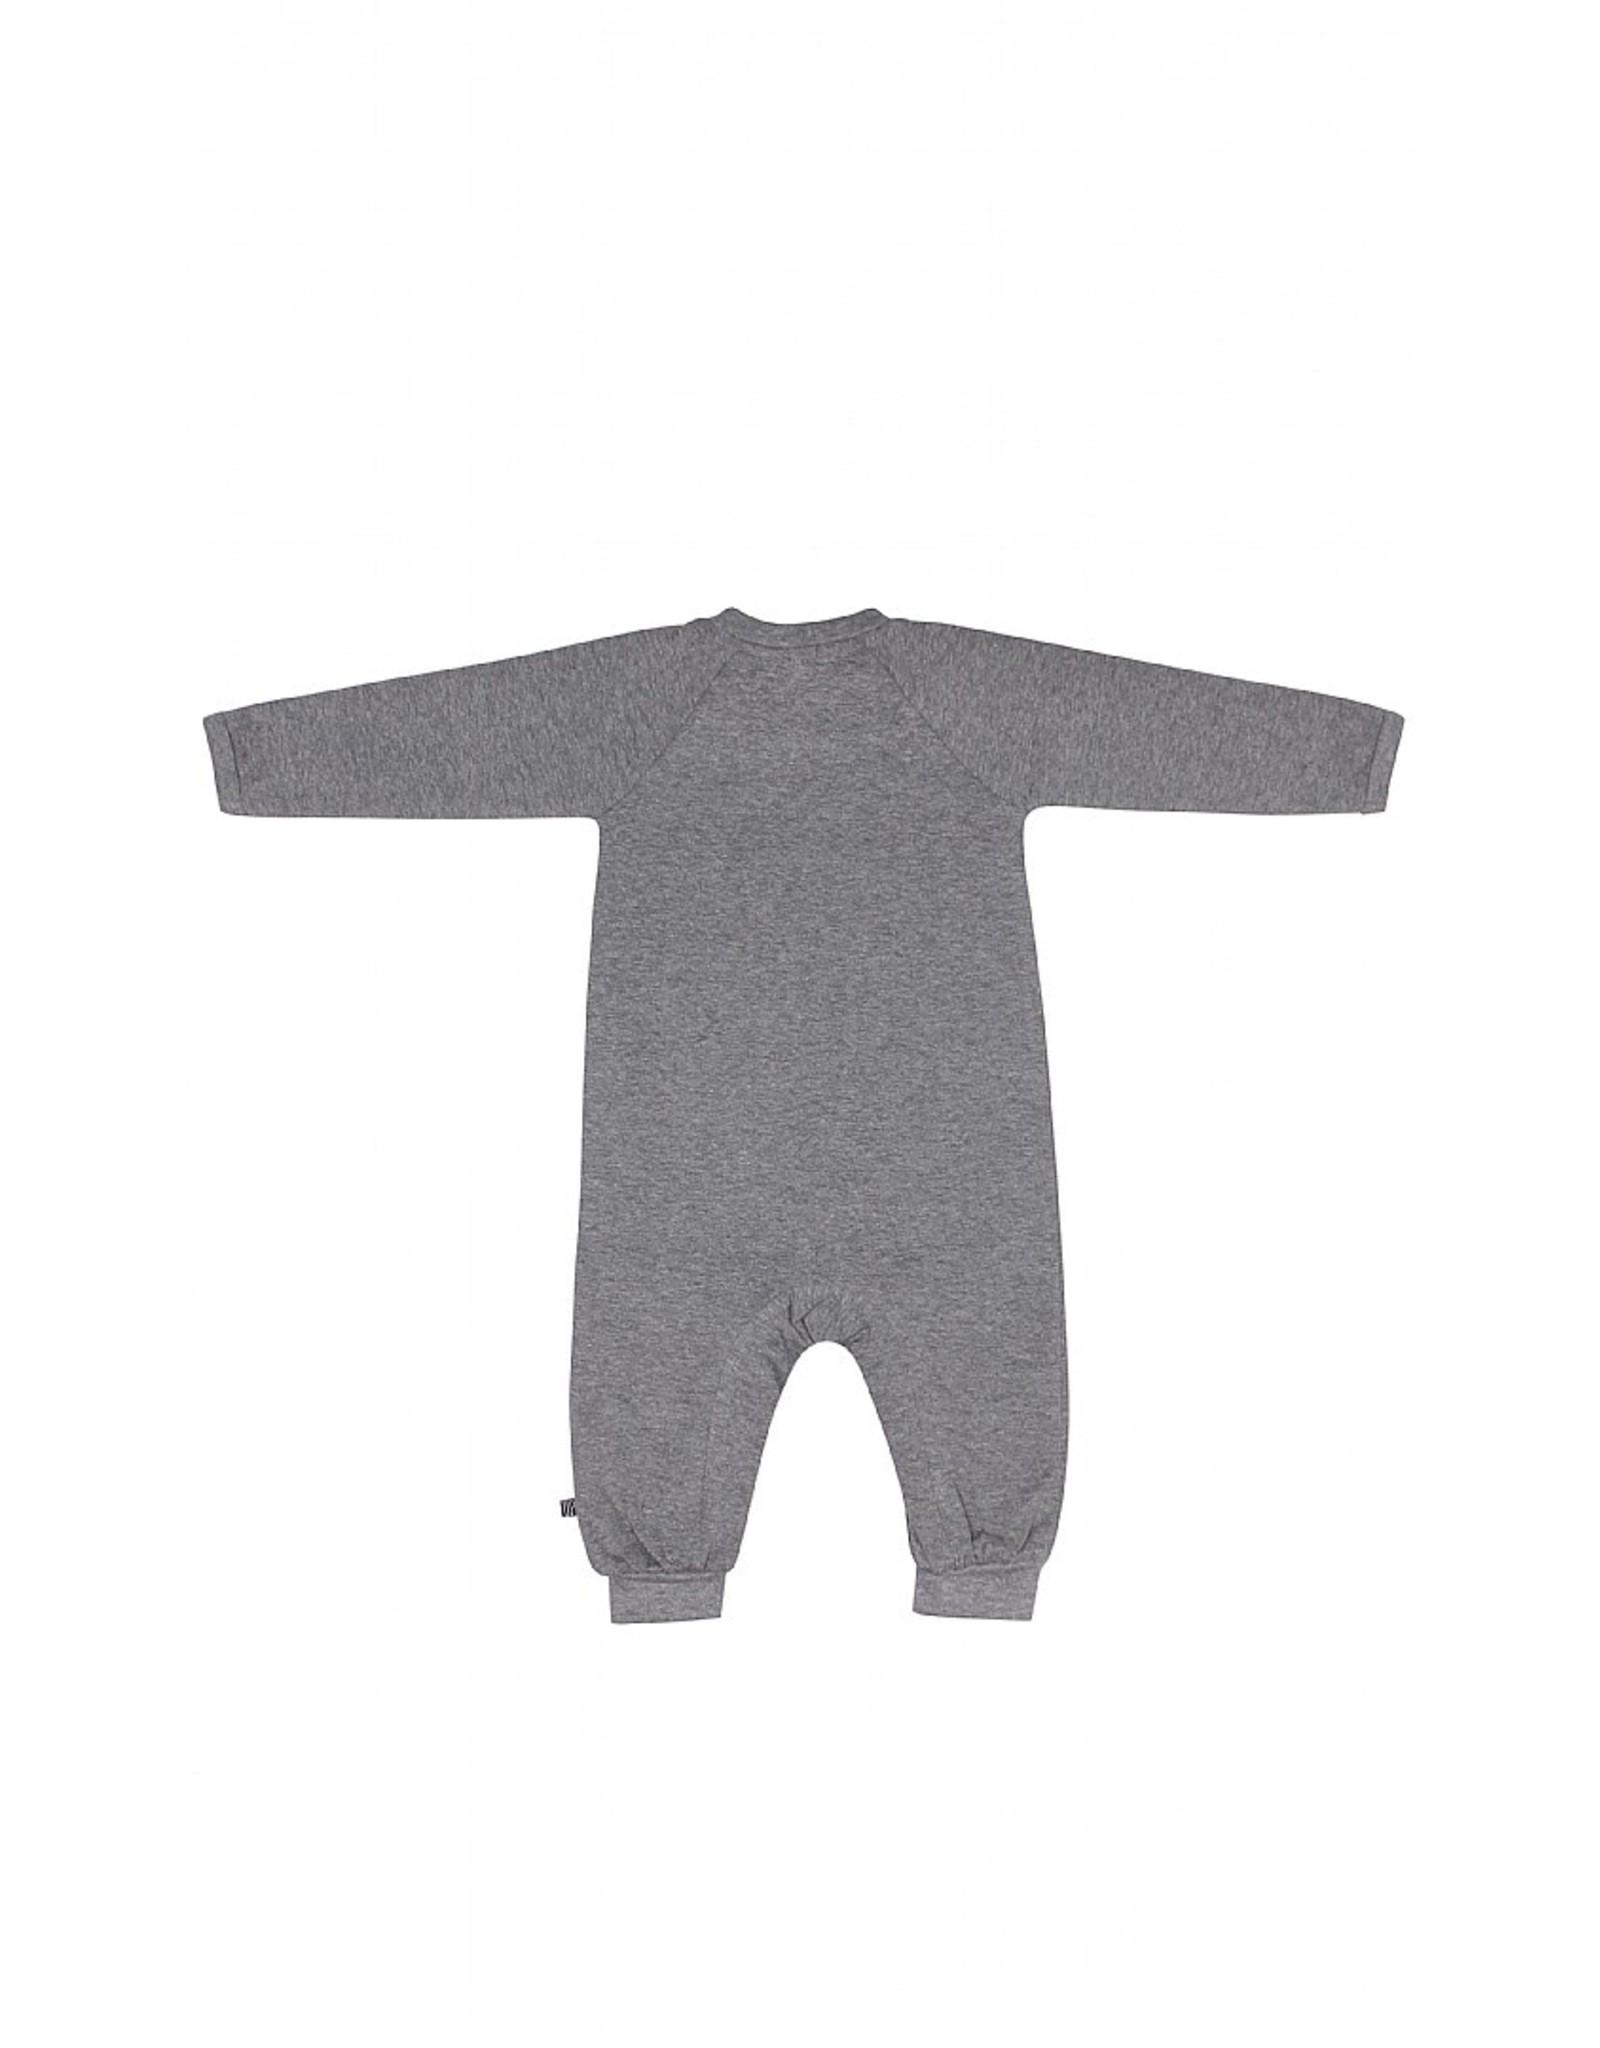 KIDS UP Kids Up Baby Suit Grey